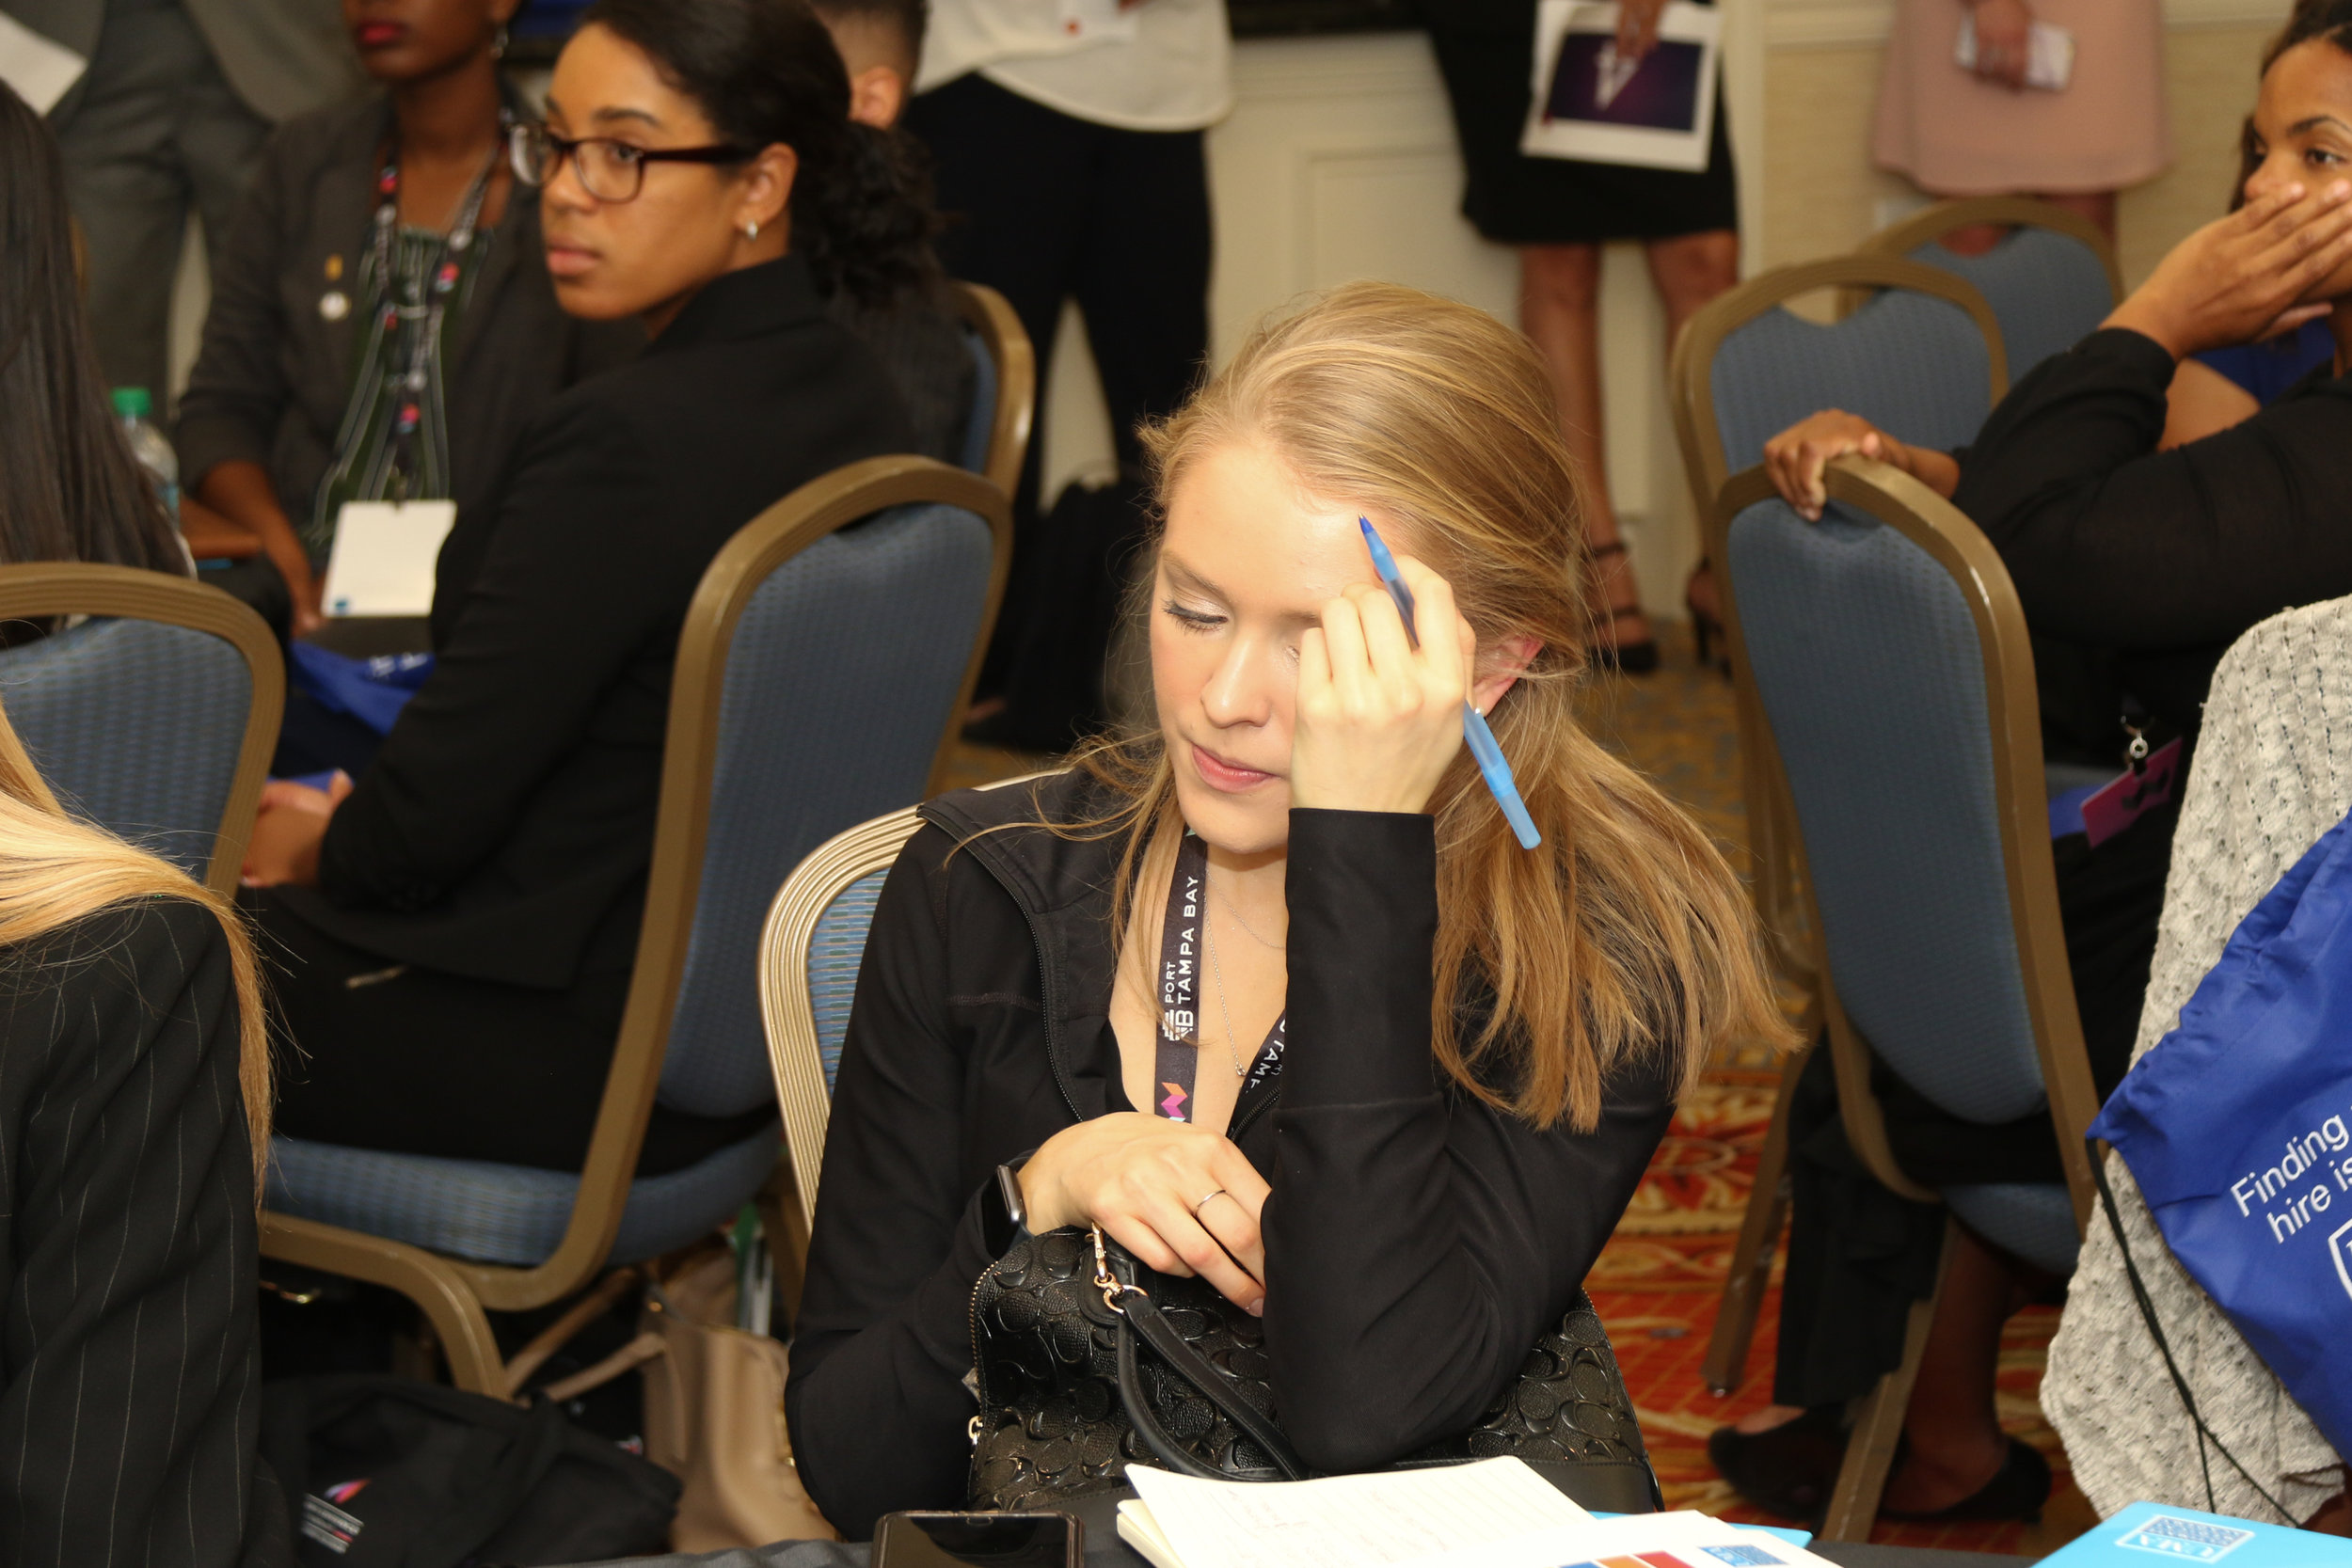 246_WomensConference_10-26-17.jpg